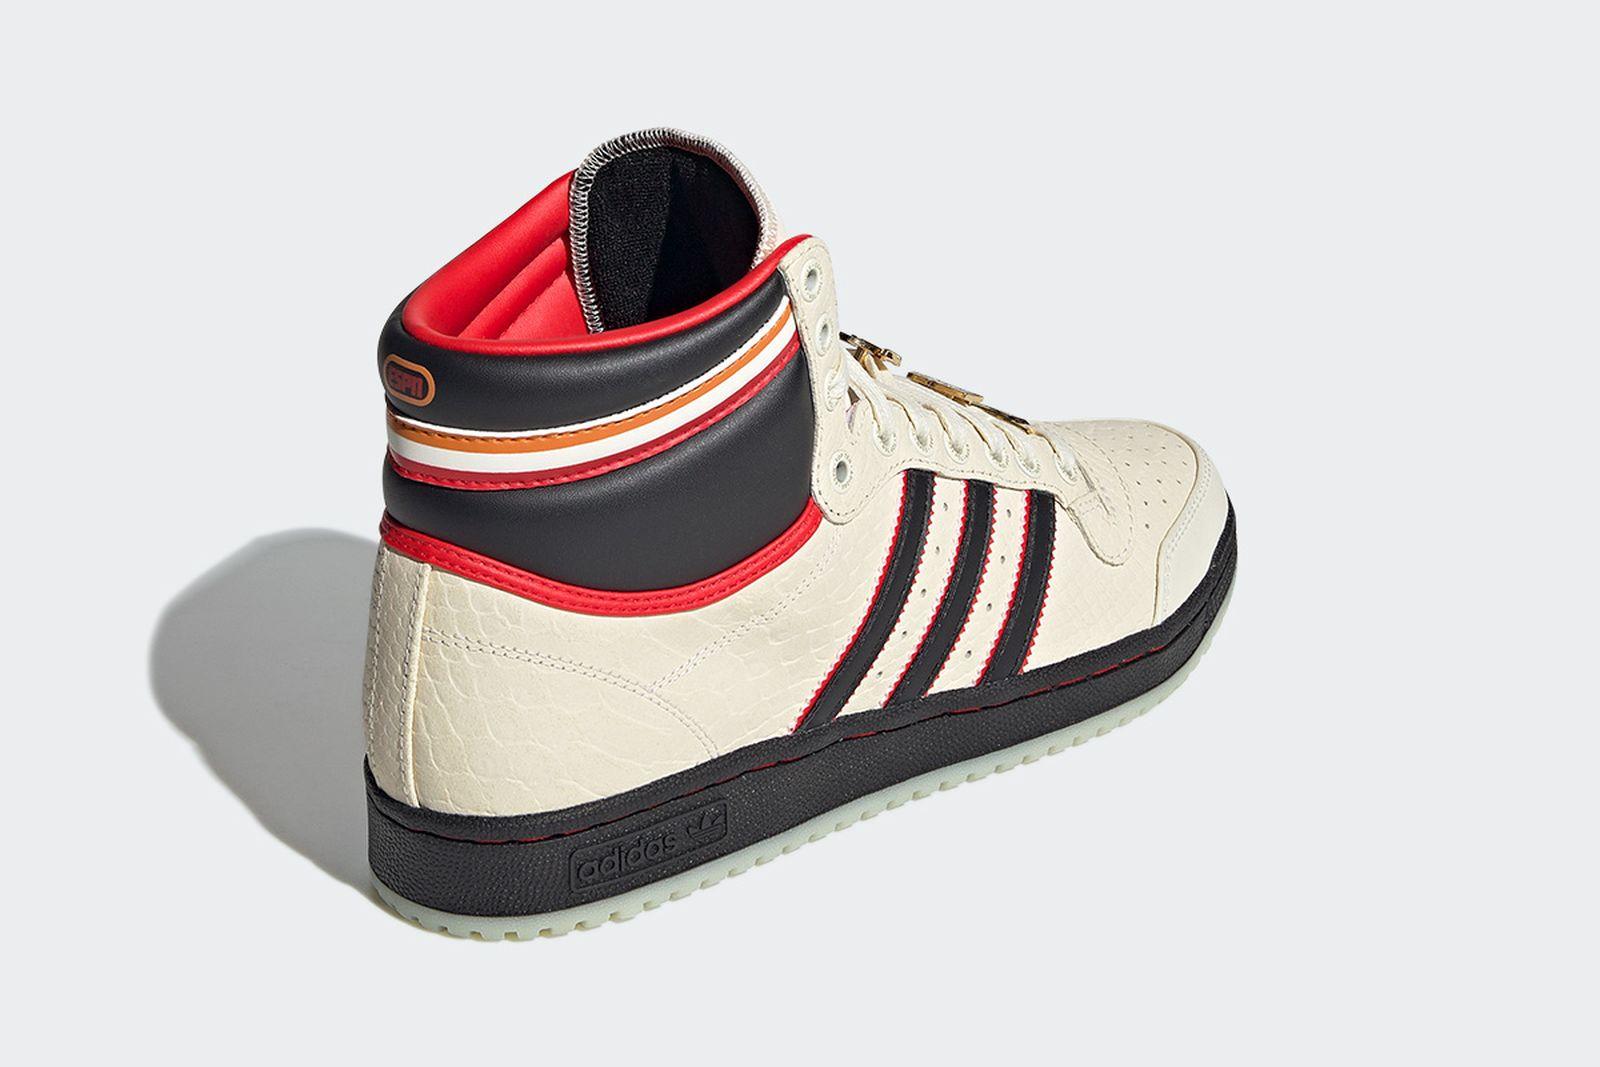 epsn-adidas-top-ten-hi-release-info-02